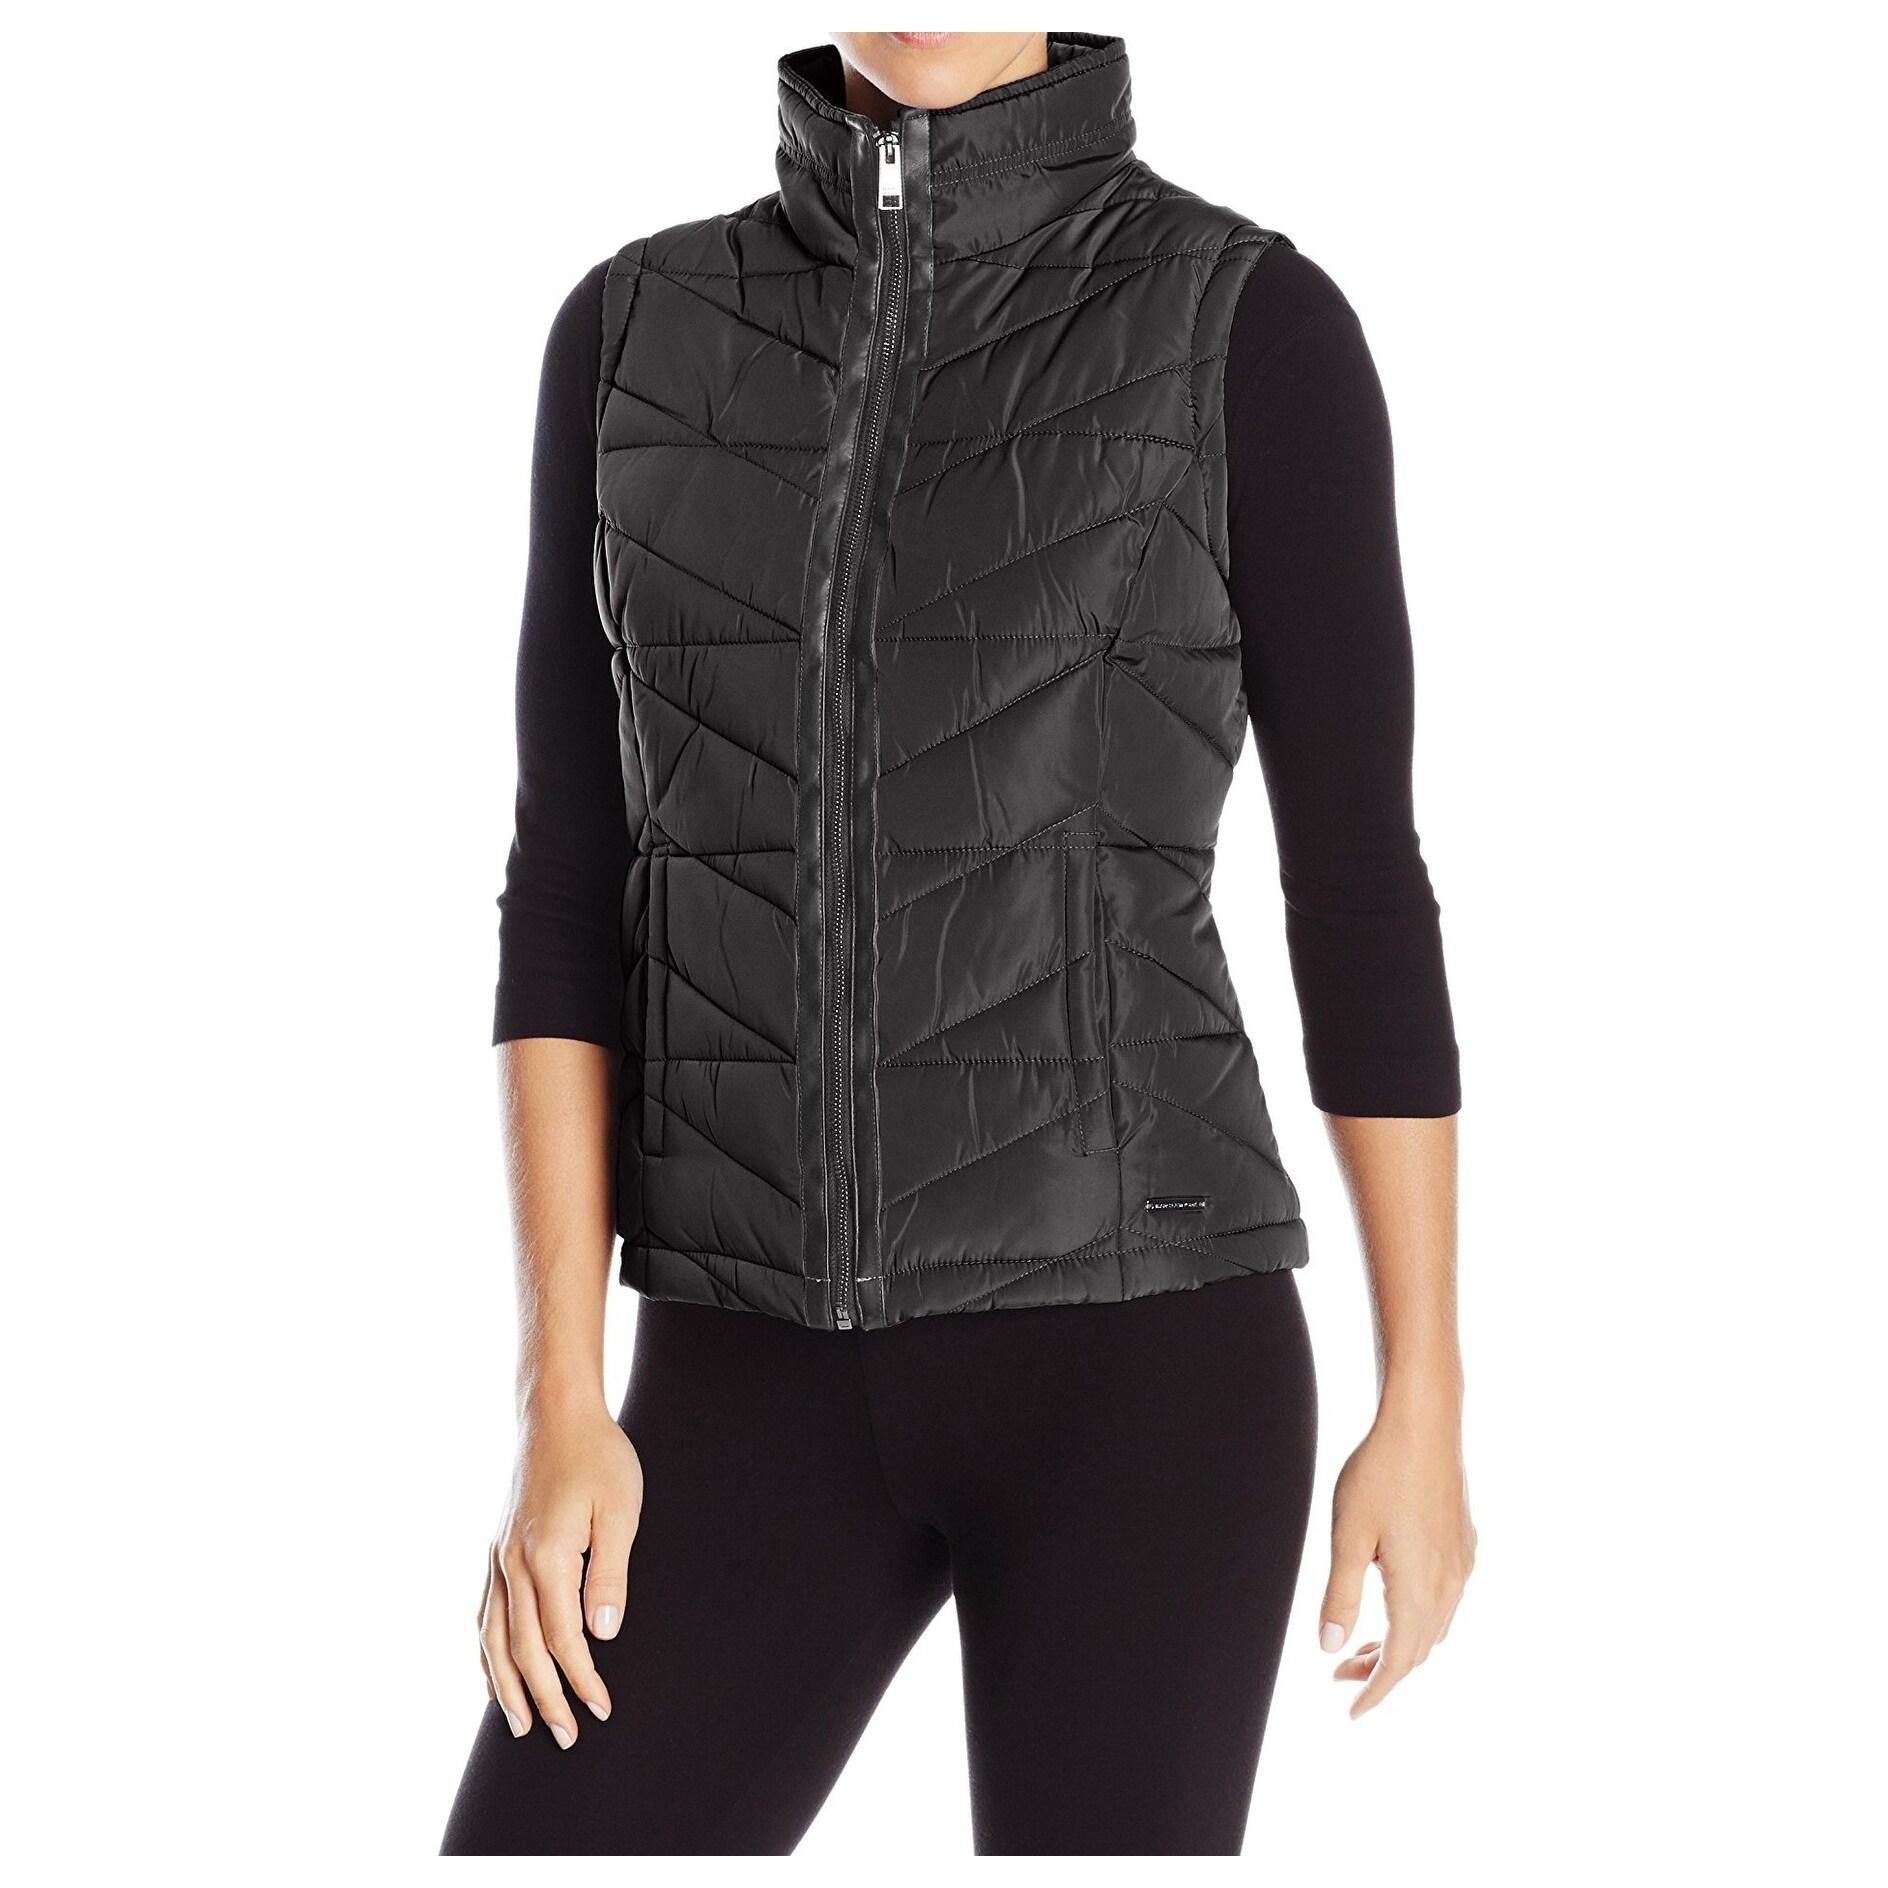 women p weskit quilted lrg belstaff s in womens black vest locksmith gilet quilt technical